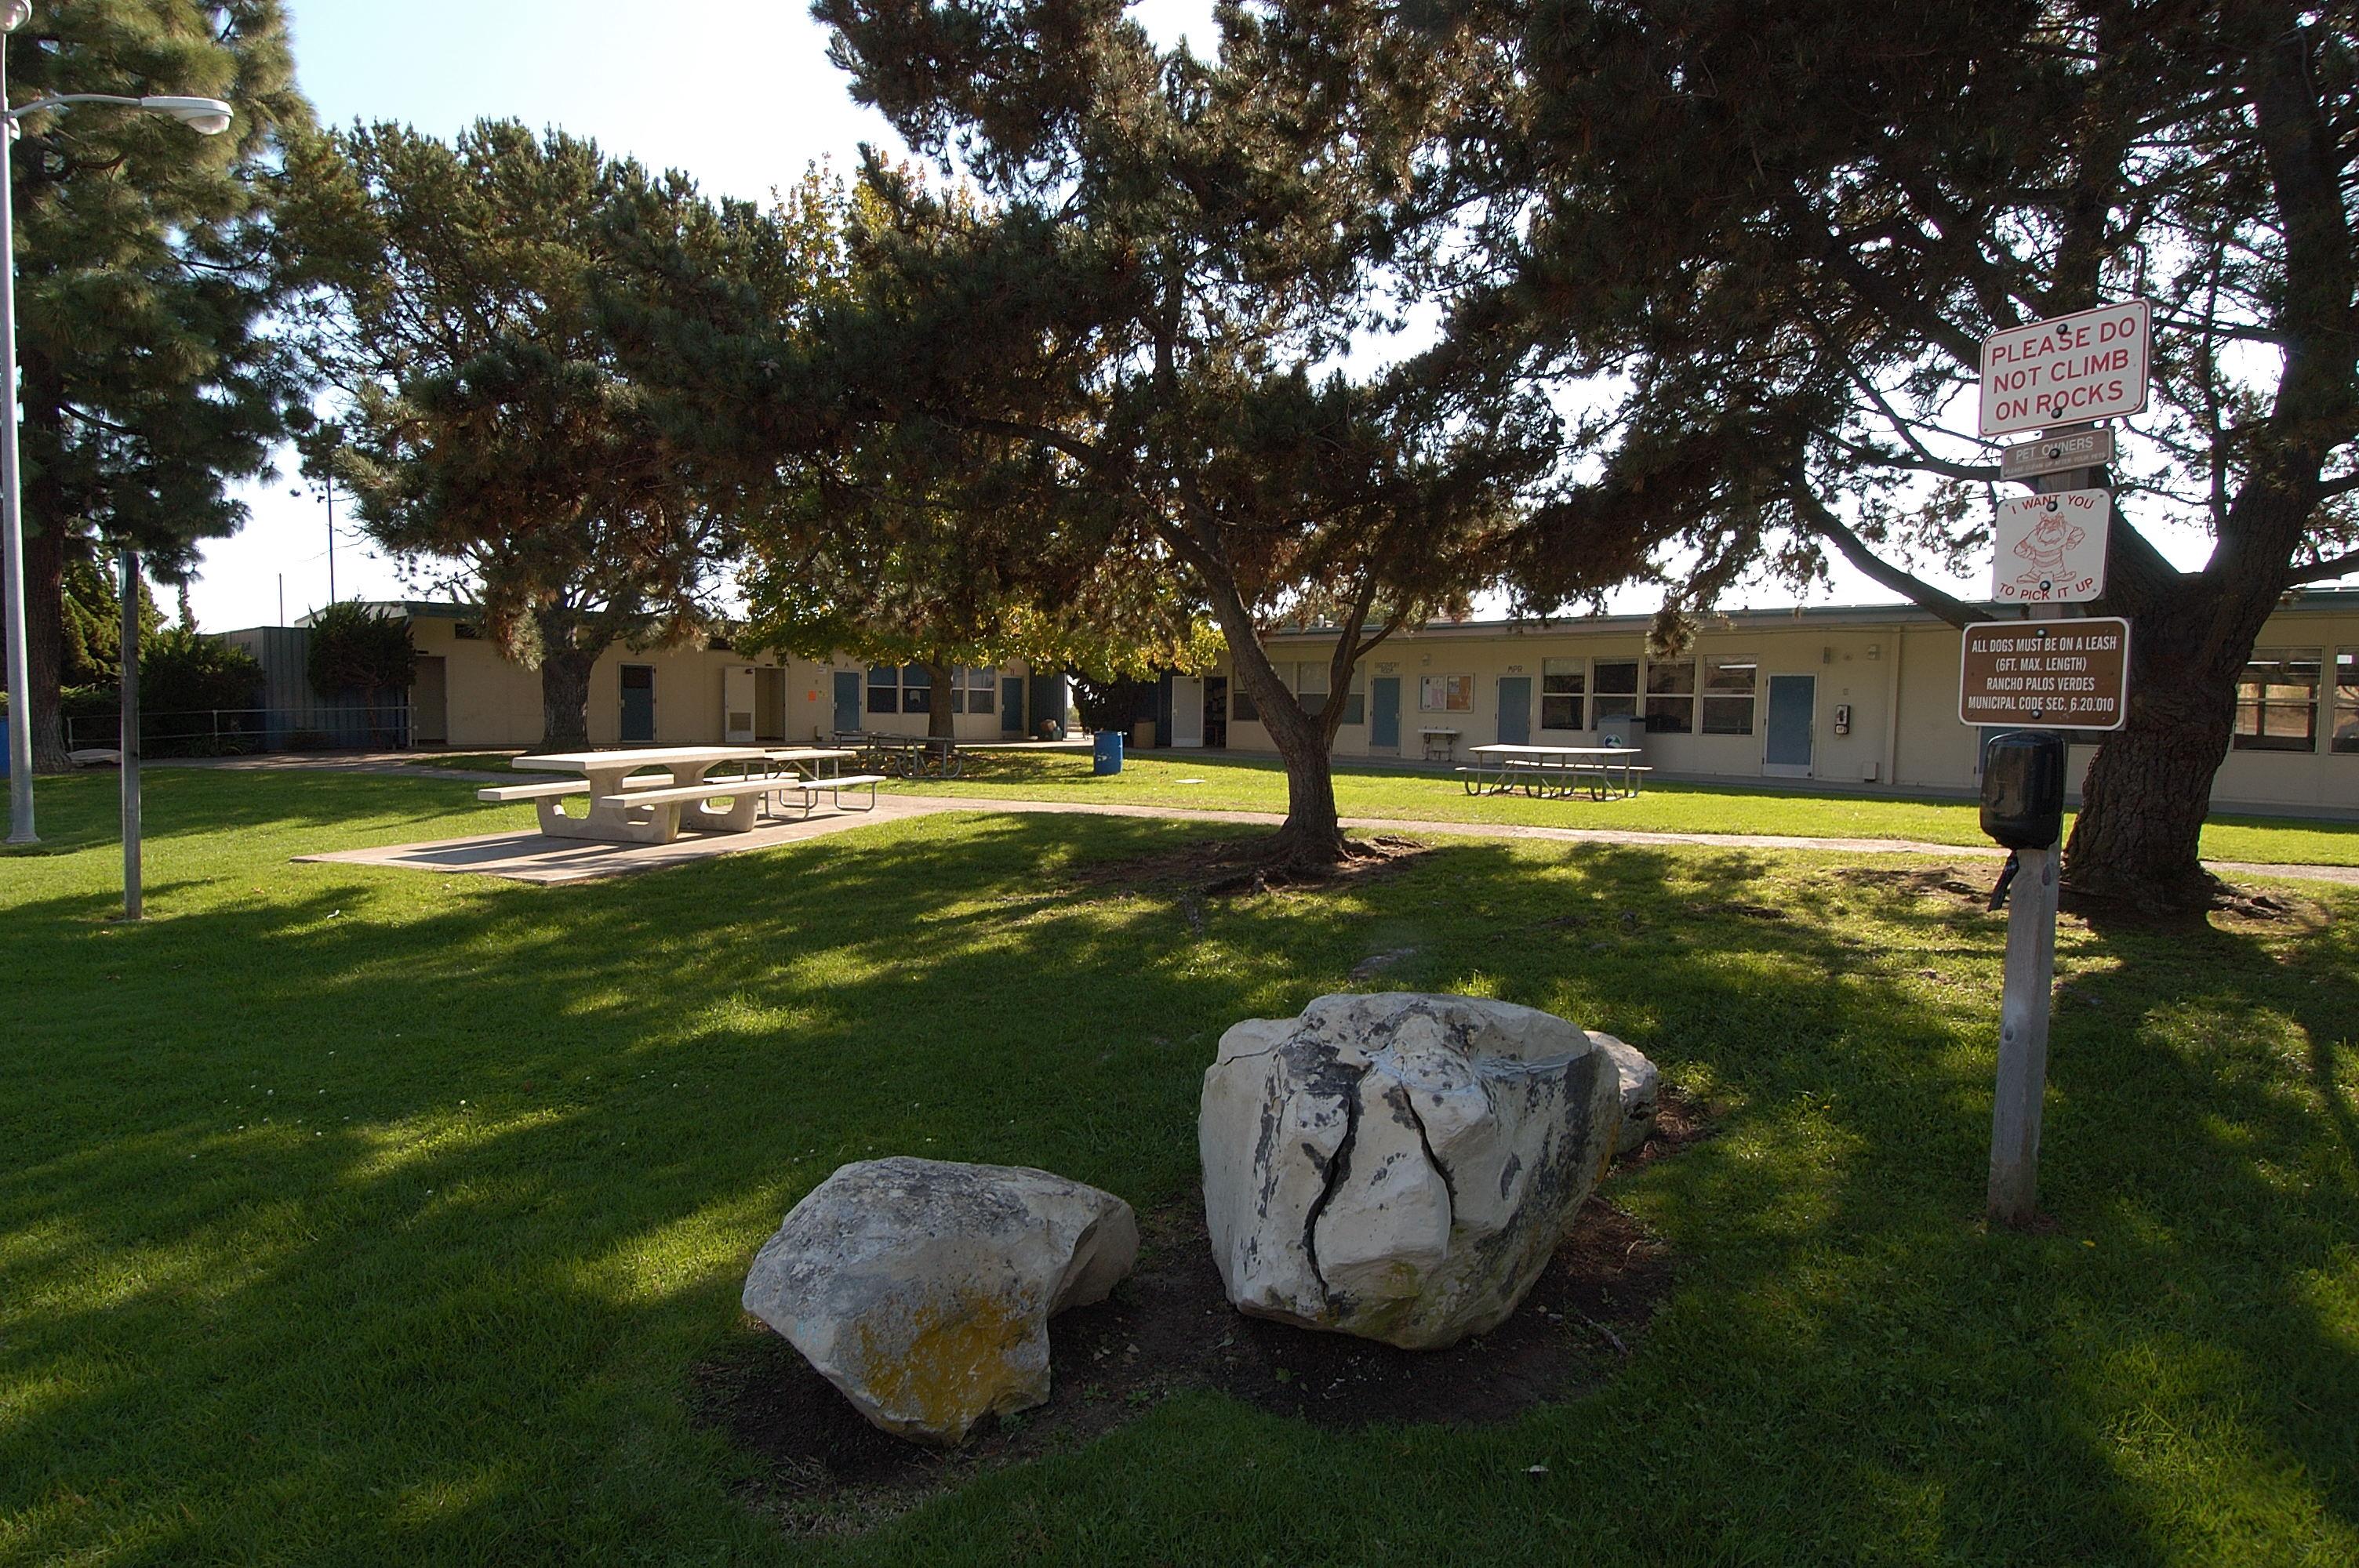 City of Rancho Palos Verdes: Parks and Facilities